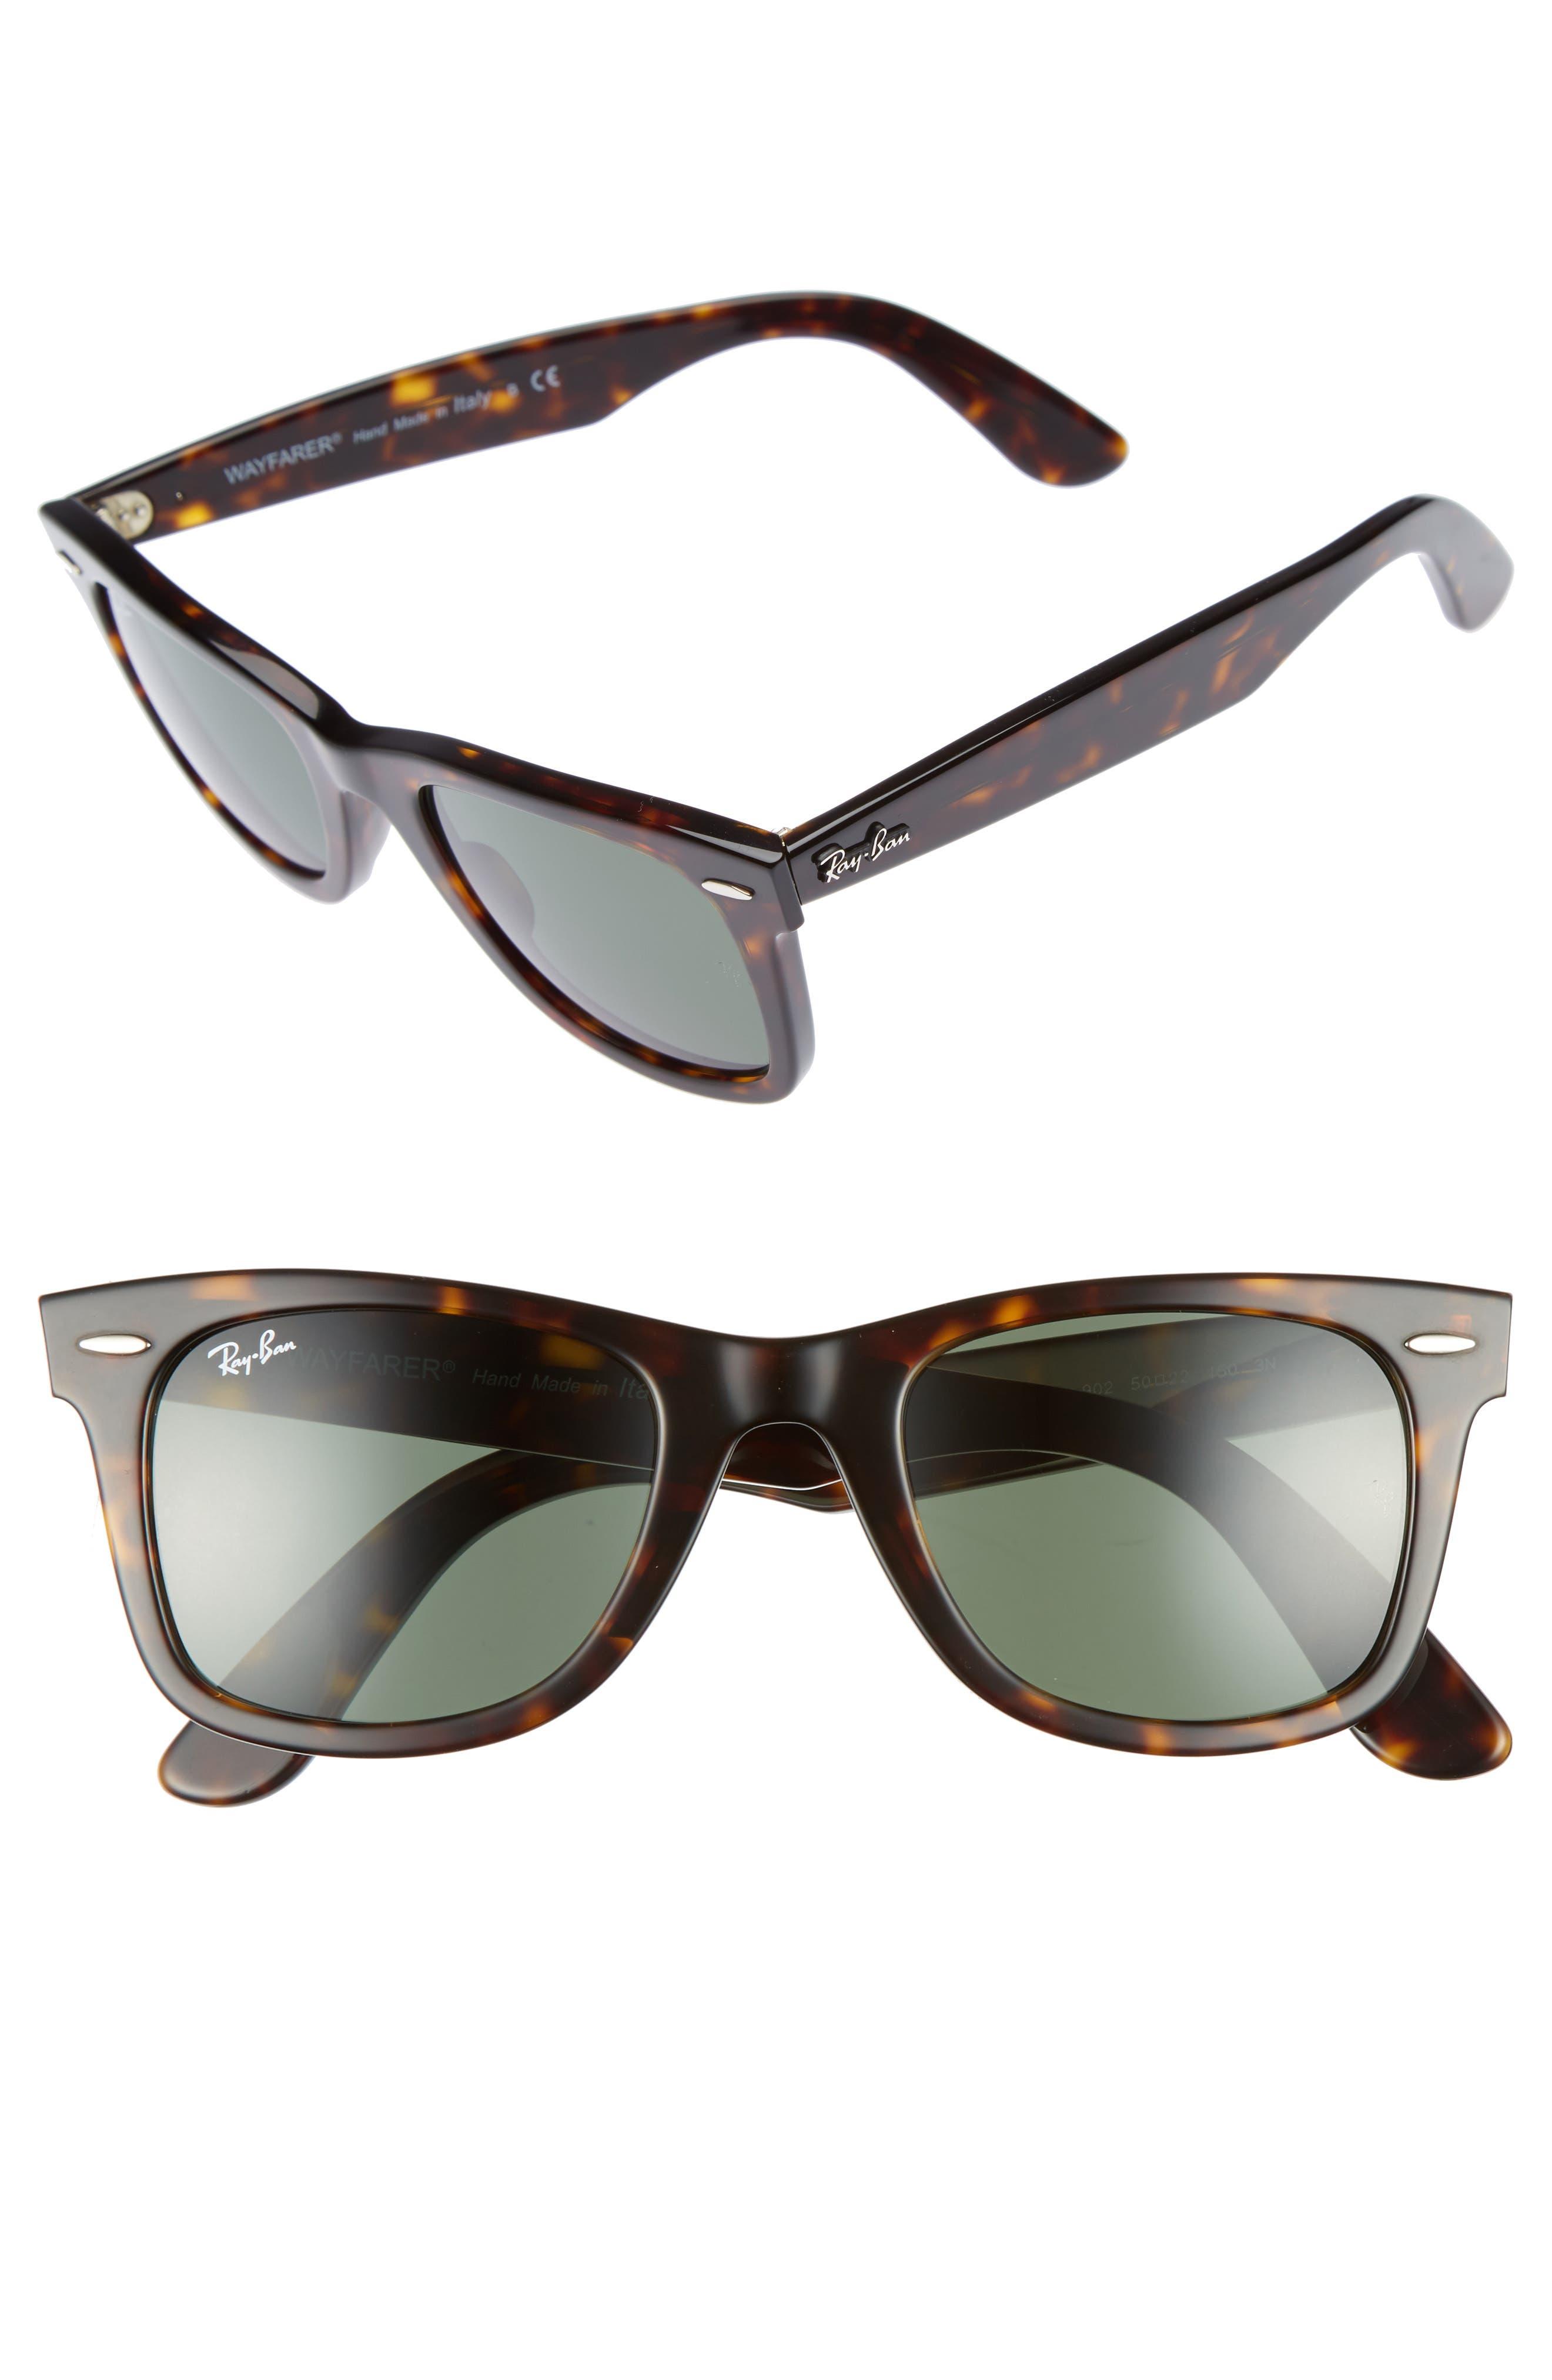 Women's Ray-Ban 'Classic Wayfarer' 50mm Sunglasses - Black/ Blue